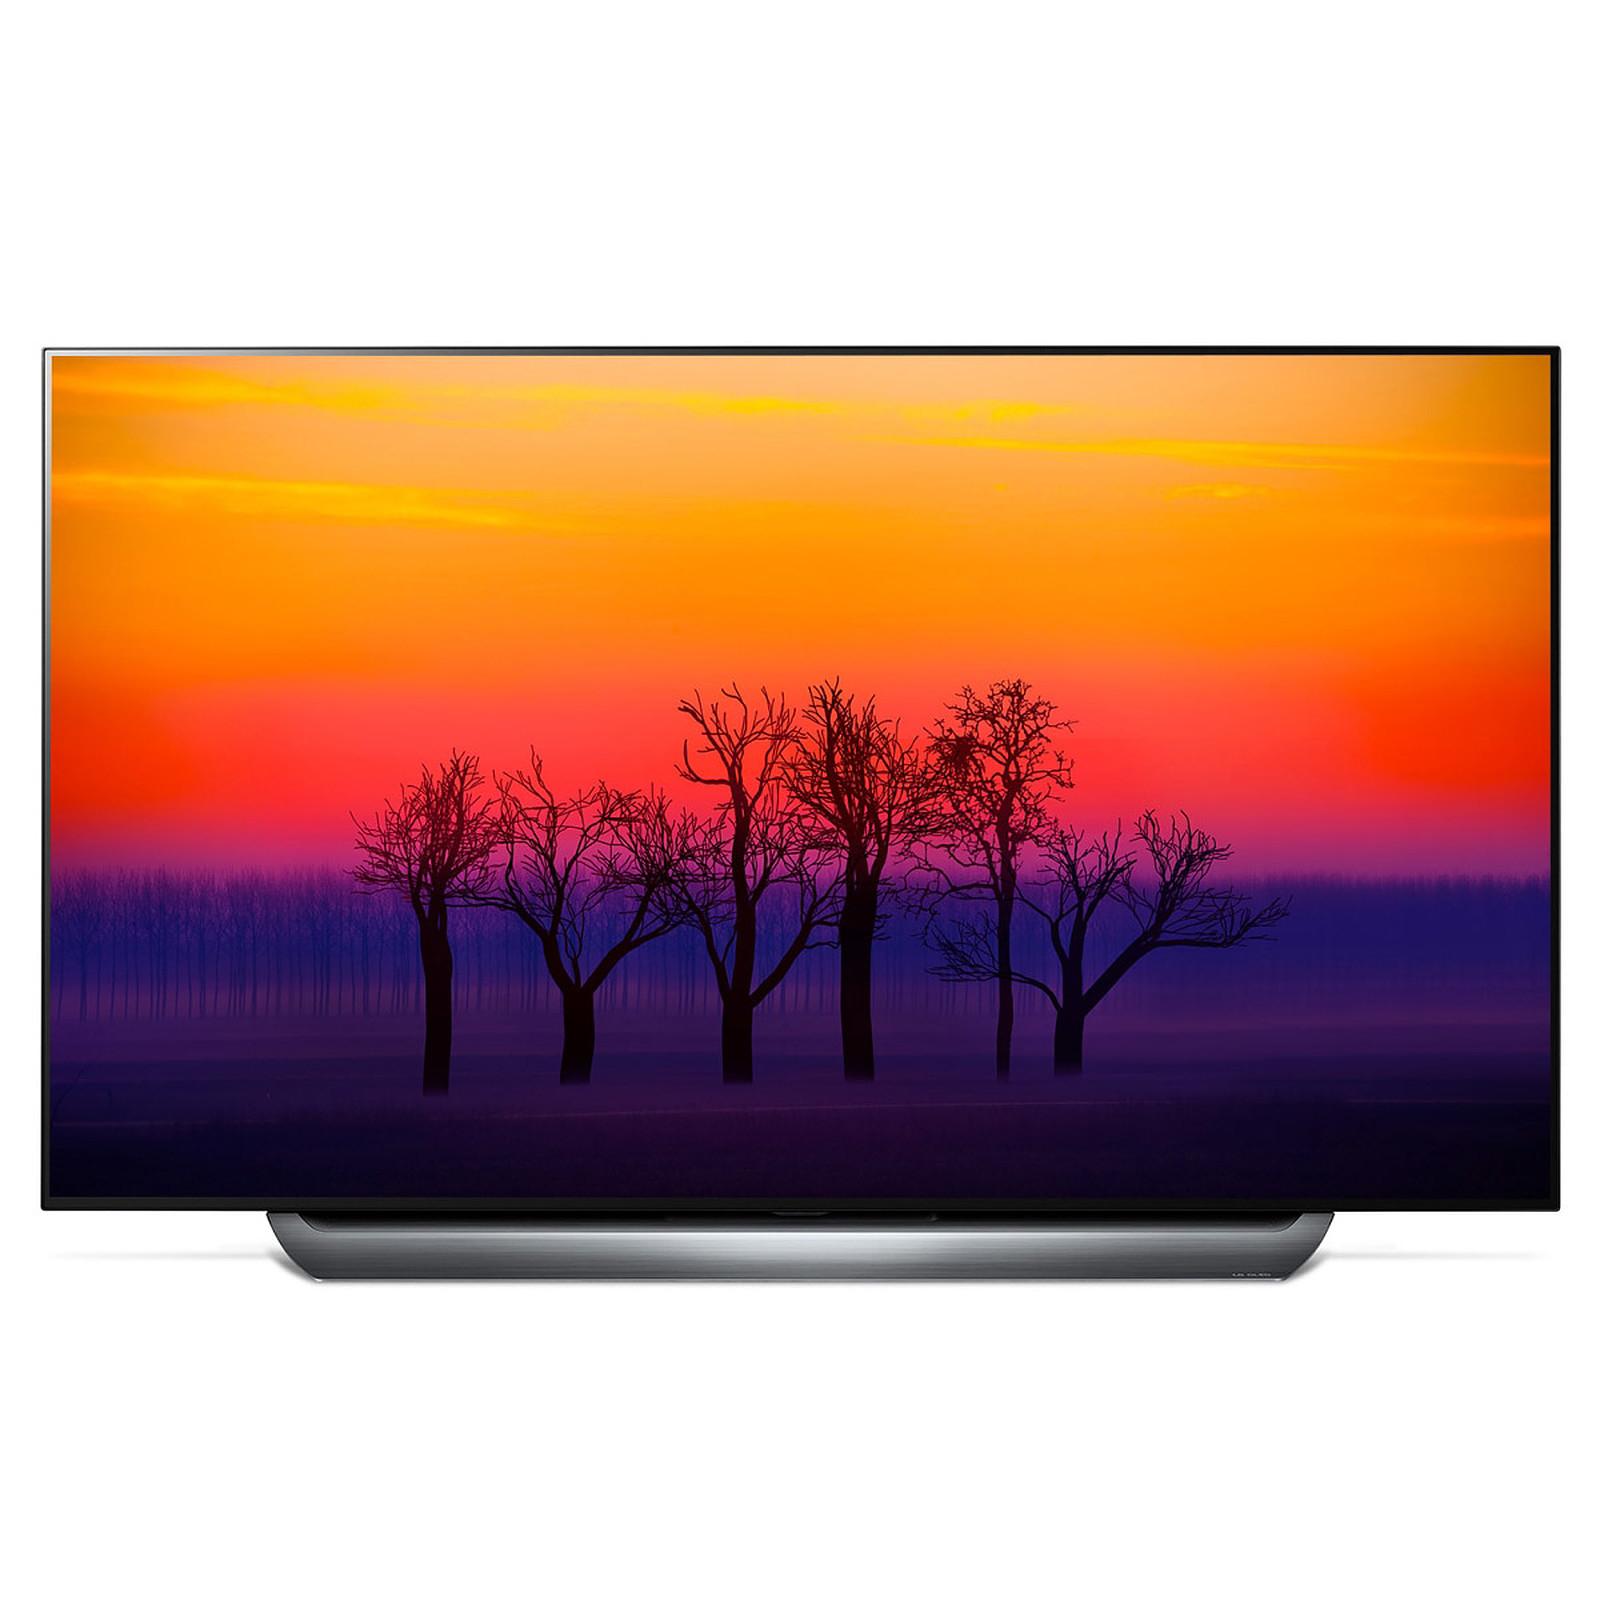 "TV 55"" LG OLED55C8 -  OLED, 4K UHD, HDR, Wi-Fi"